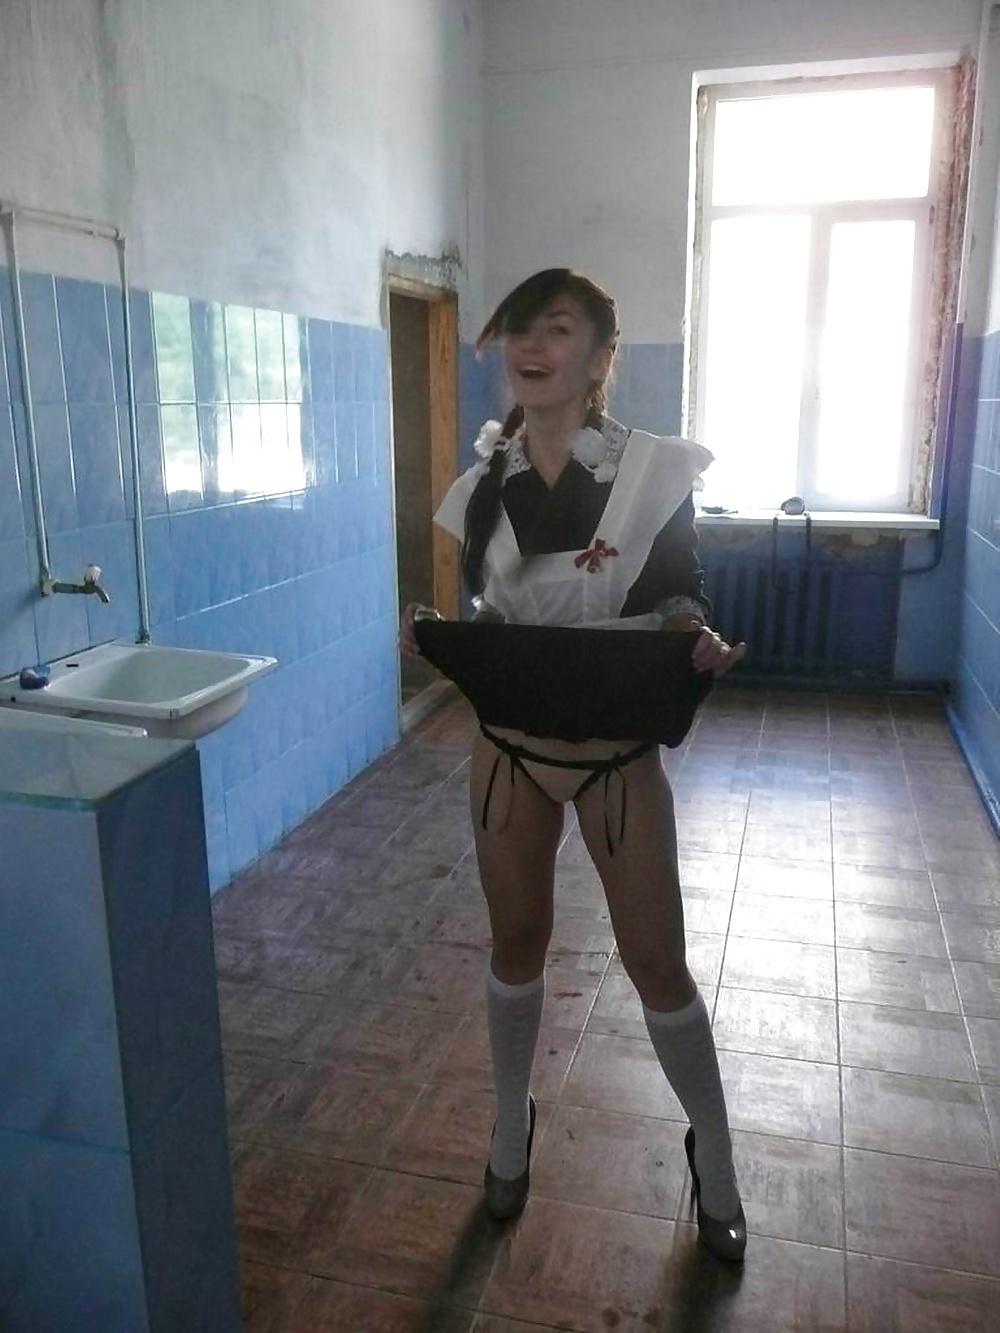 Фото вчителя в туалетів 5 фотография